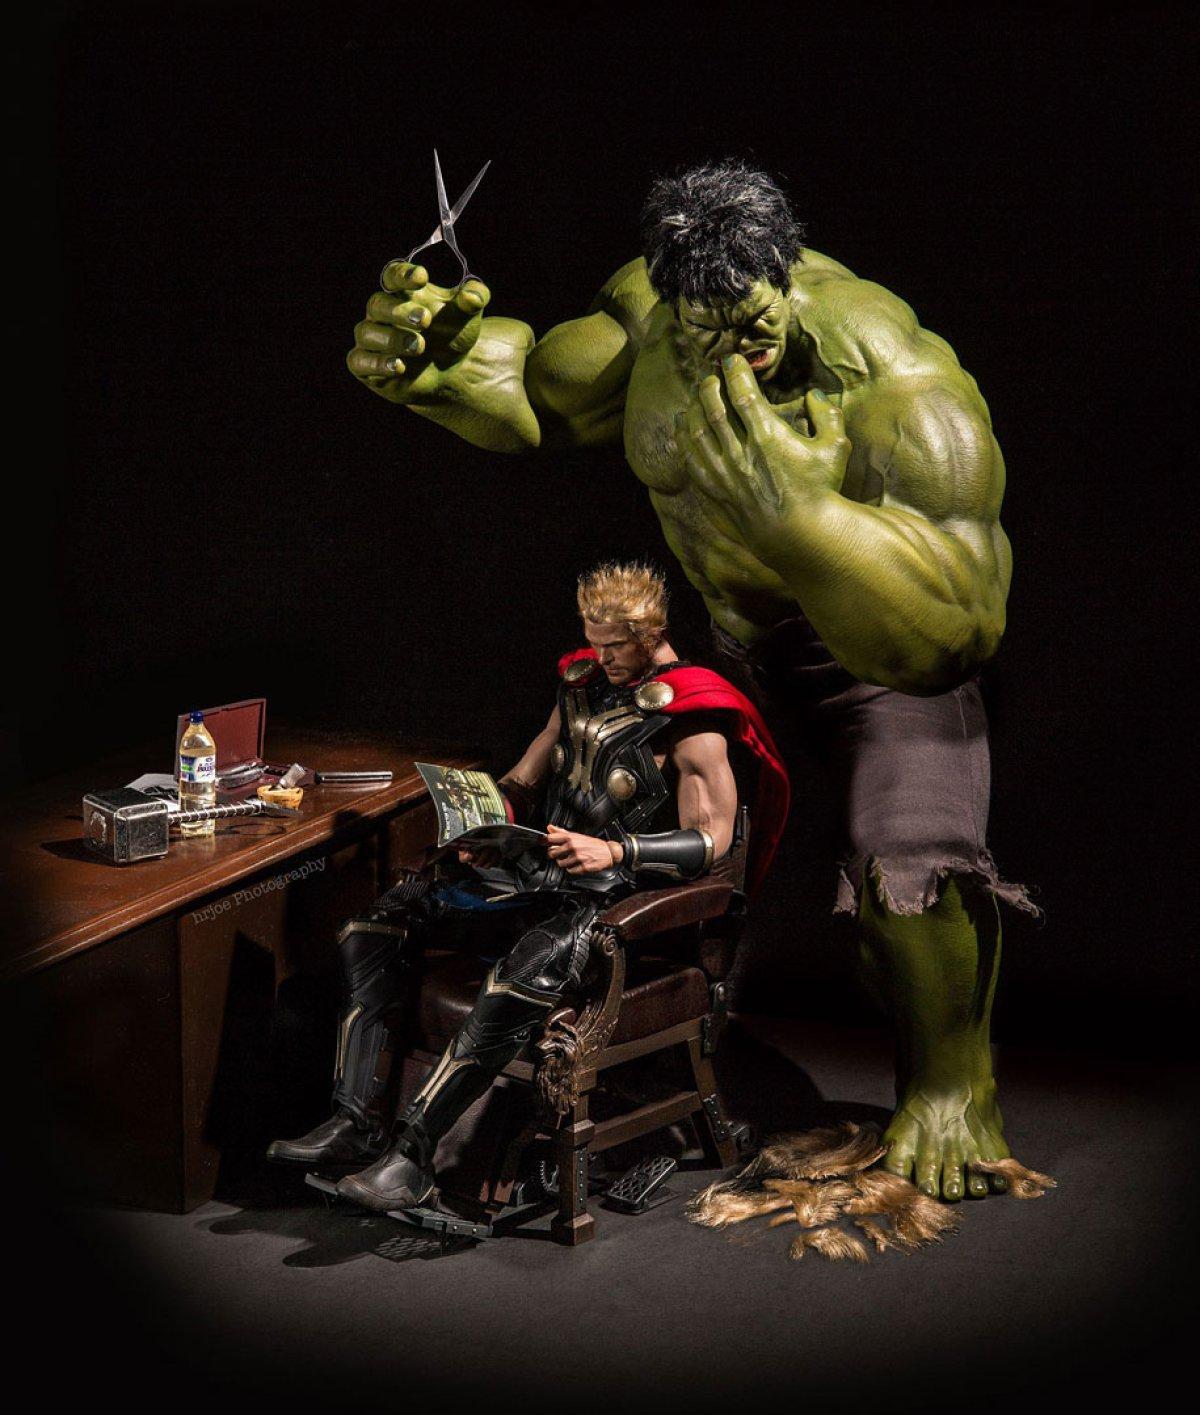 superhero-edy-hardjo-05